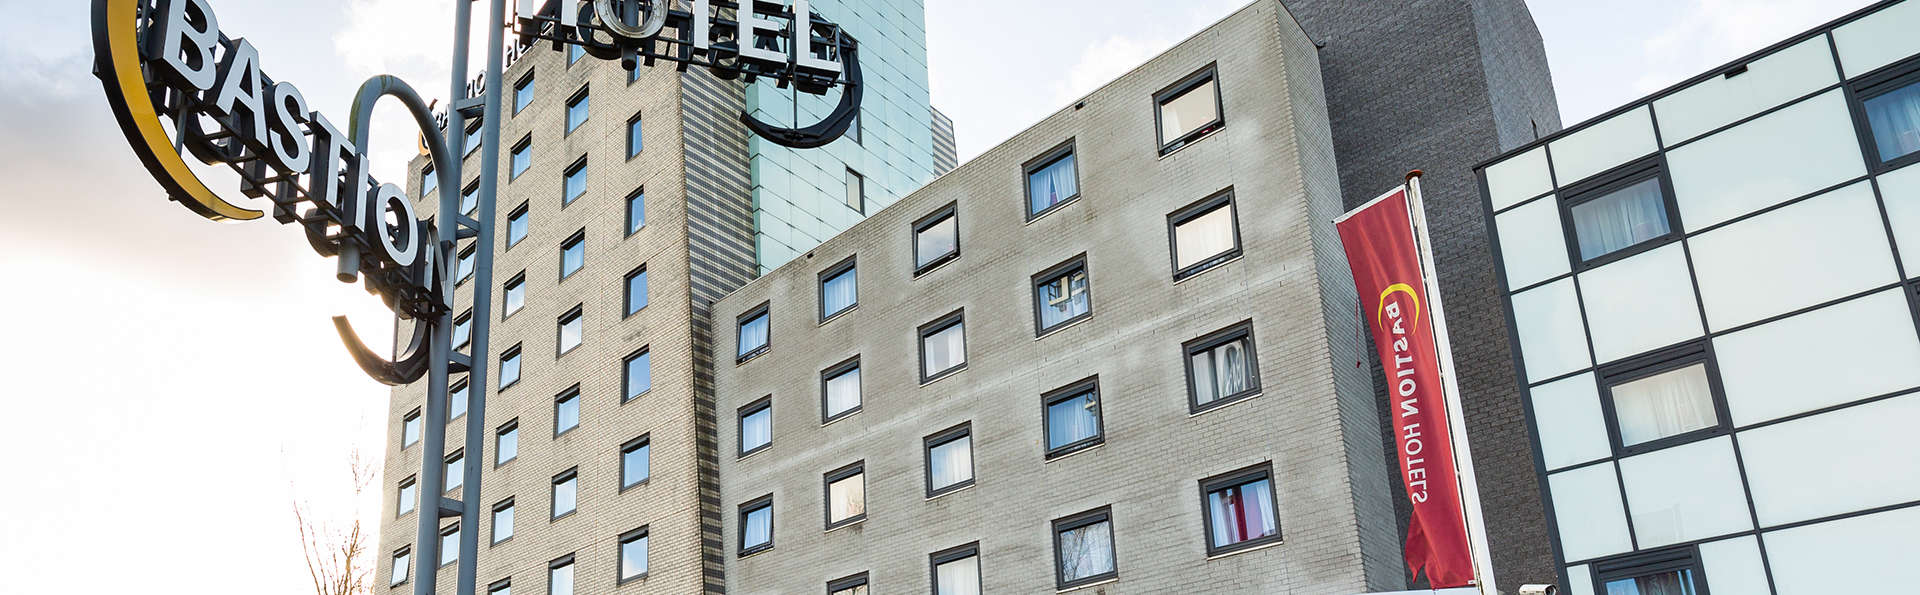 Bastion Hotel Amsterdam Amstel - EDIT_FRONT.jpg